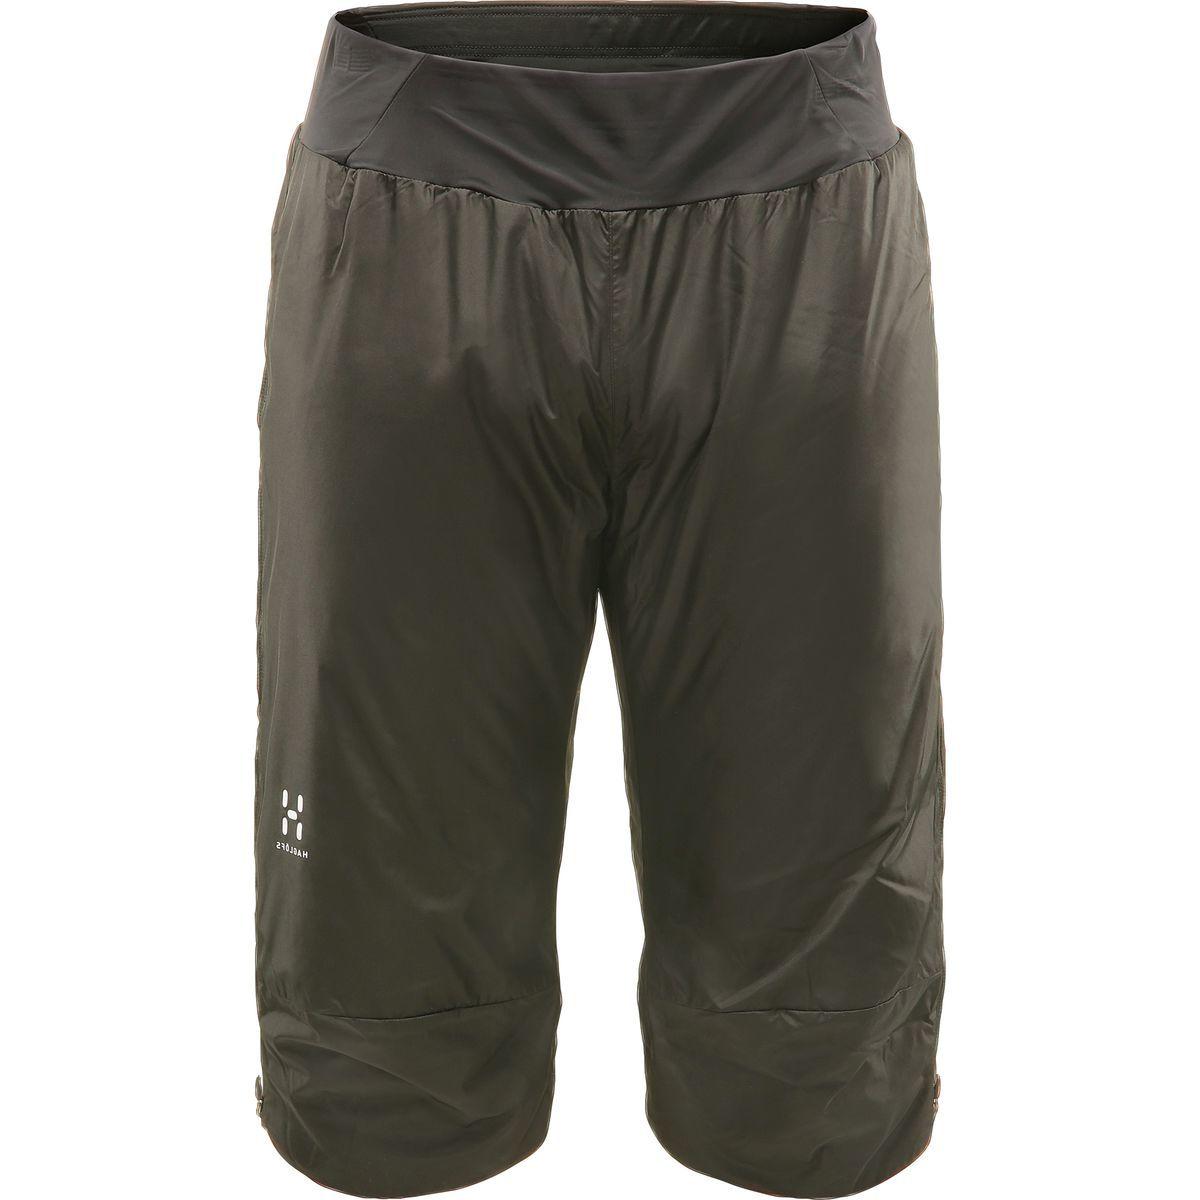 Haglofs Barrier Knee Pant - Men's